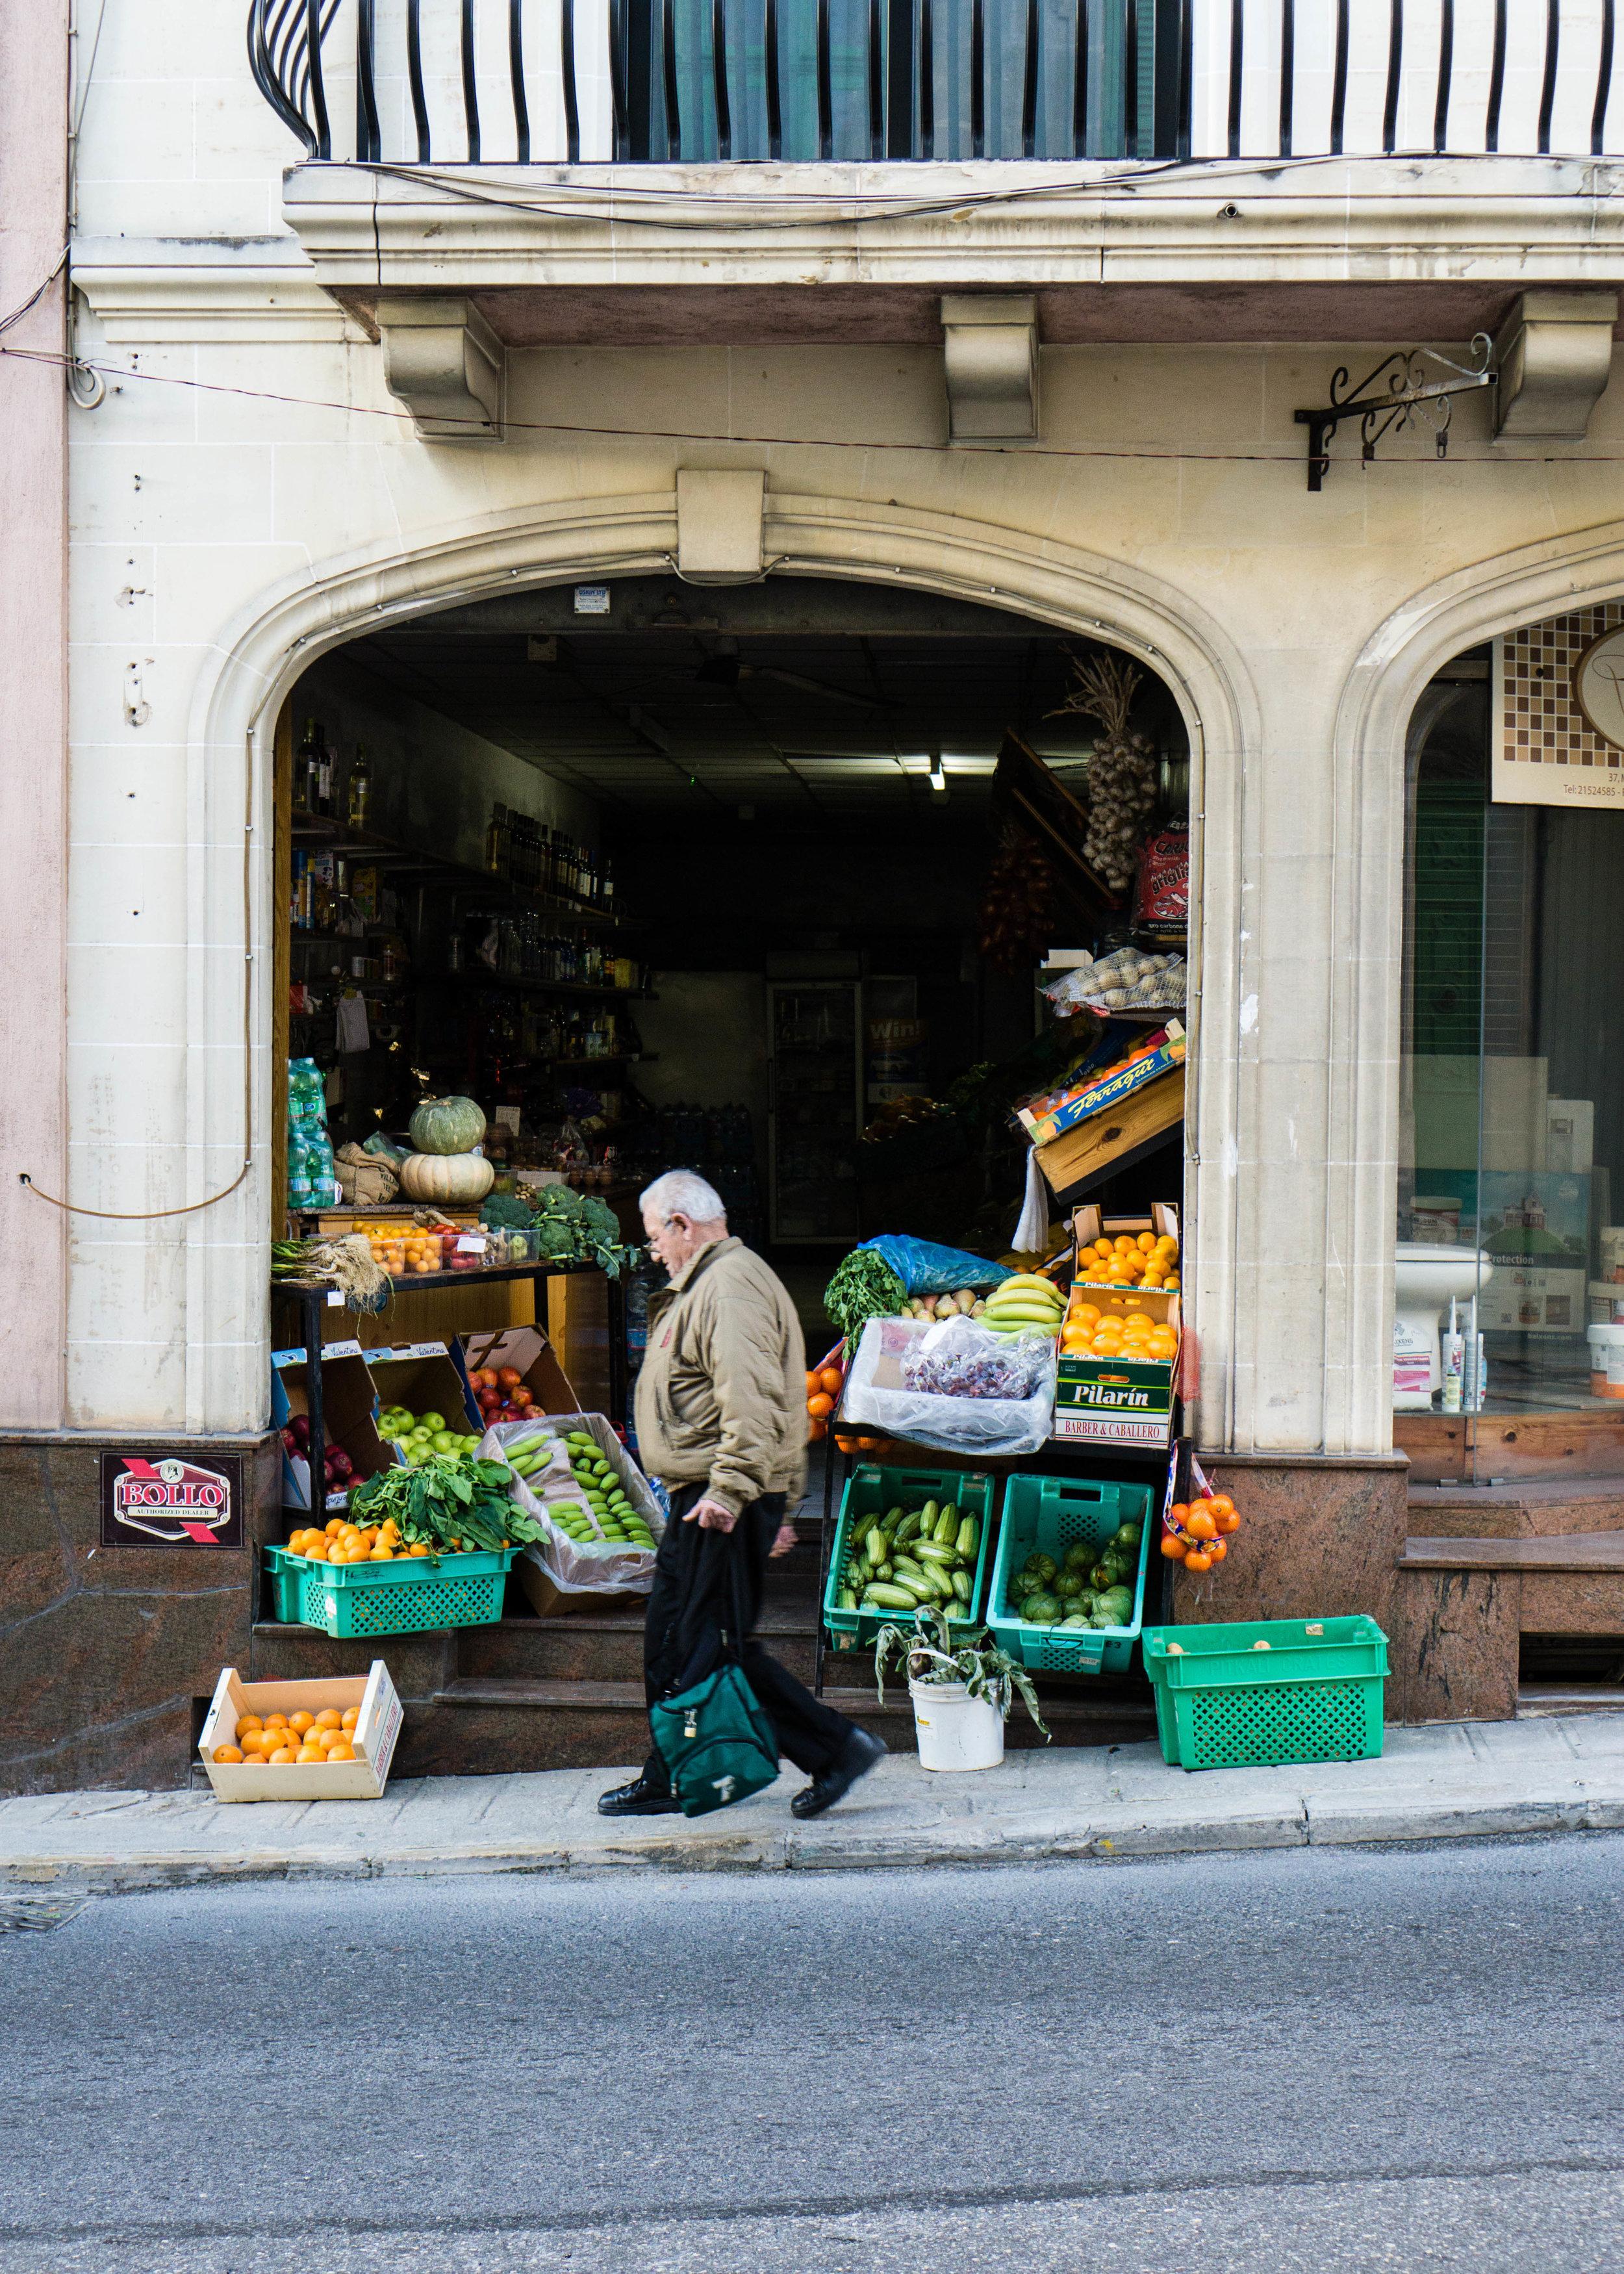 Produce store, Malta